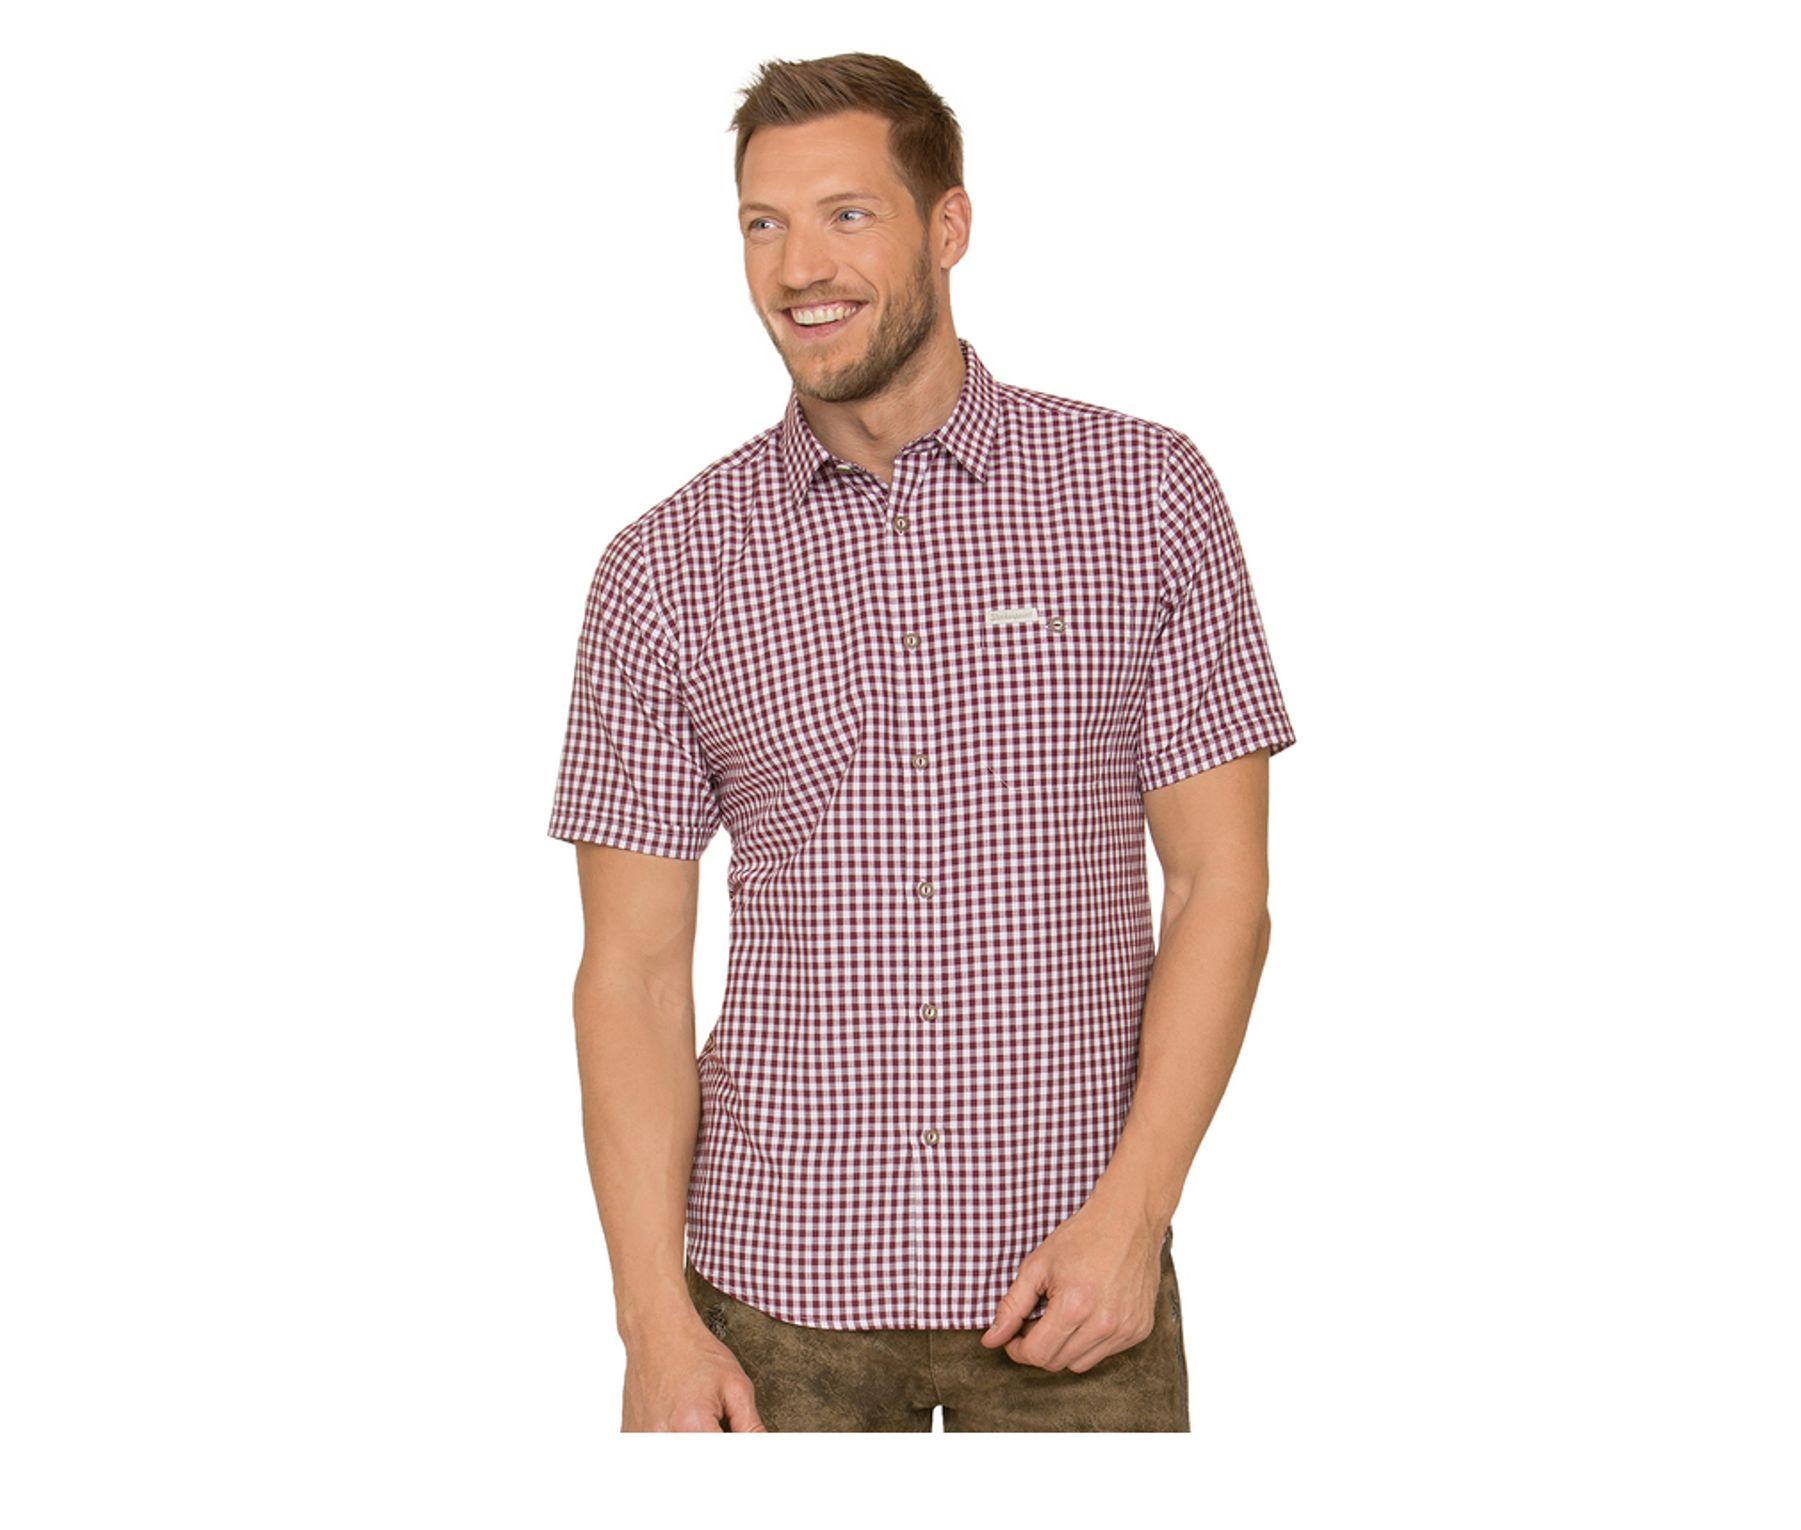 Stockerpoint - Herren kurzarm Trachtenhemd in verschiedenen Farben, Renko3 – Bild 1